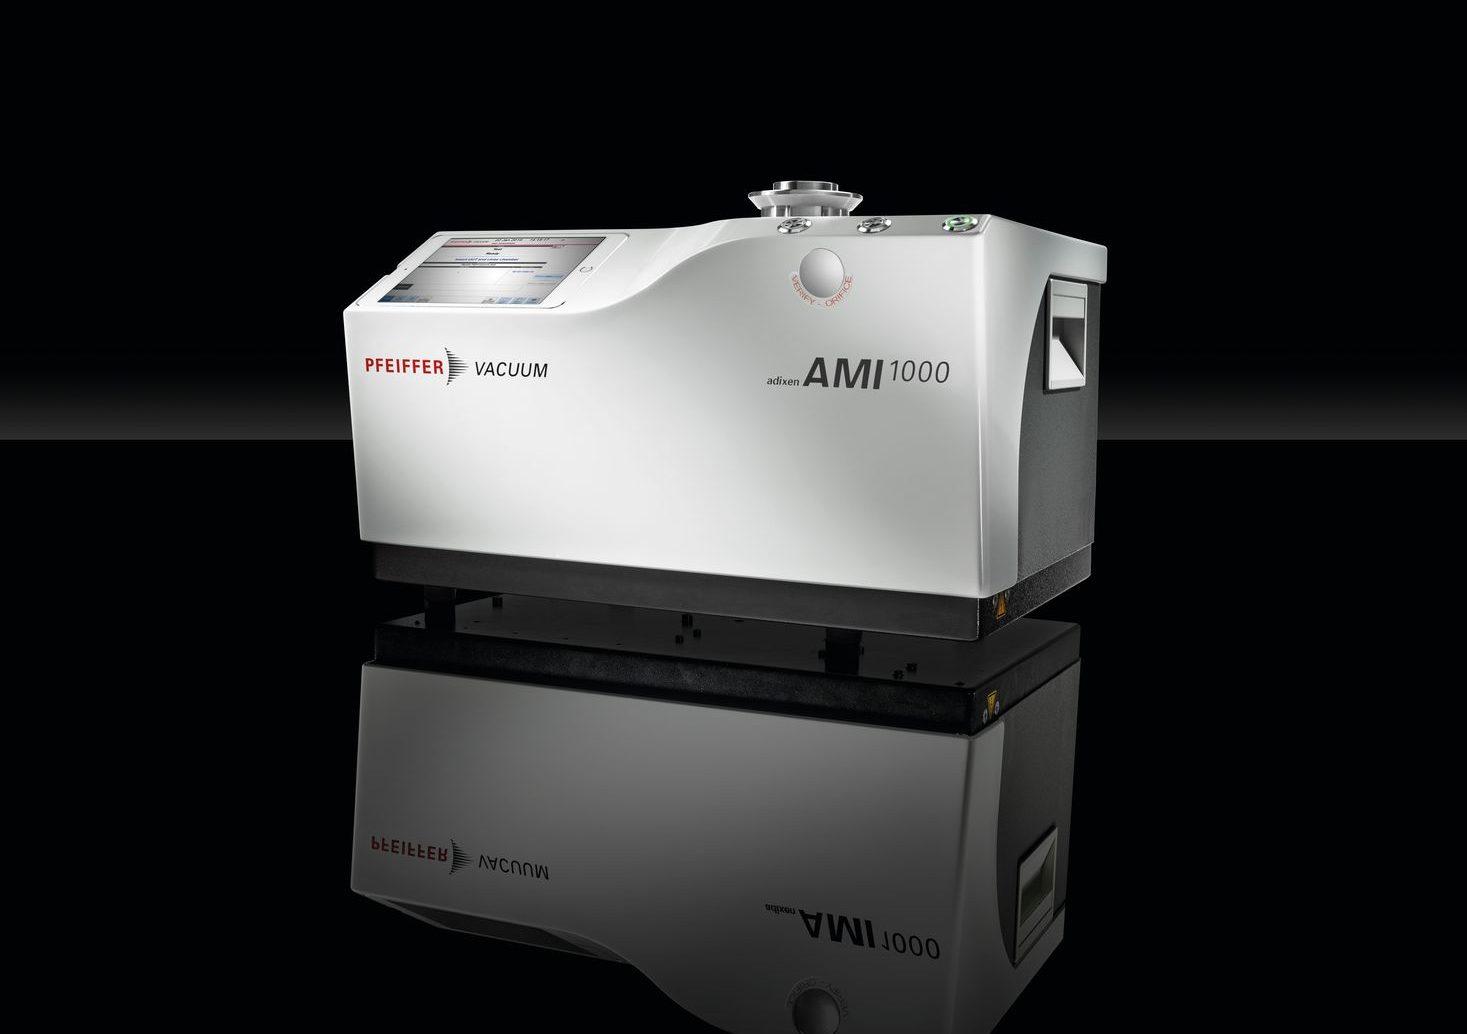 AMI 1000 Pfeiffer Vacuum France